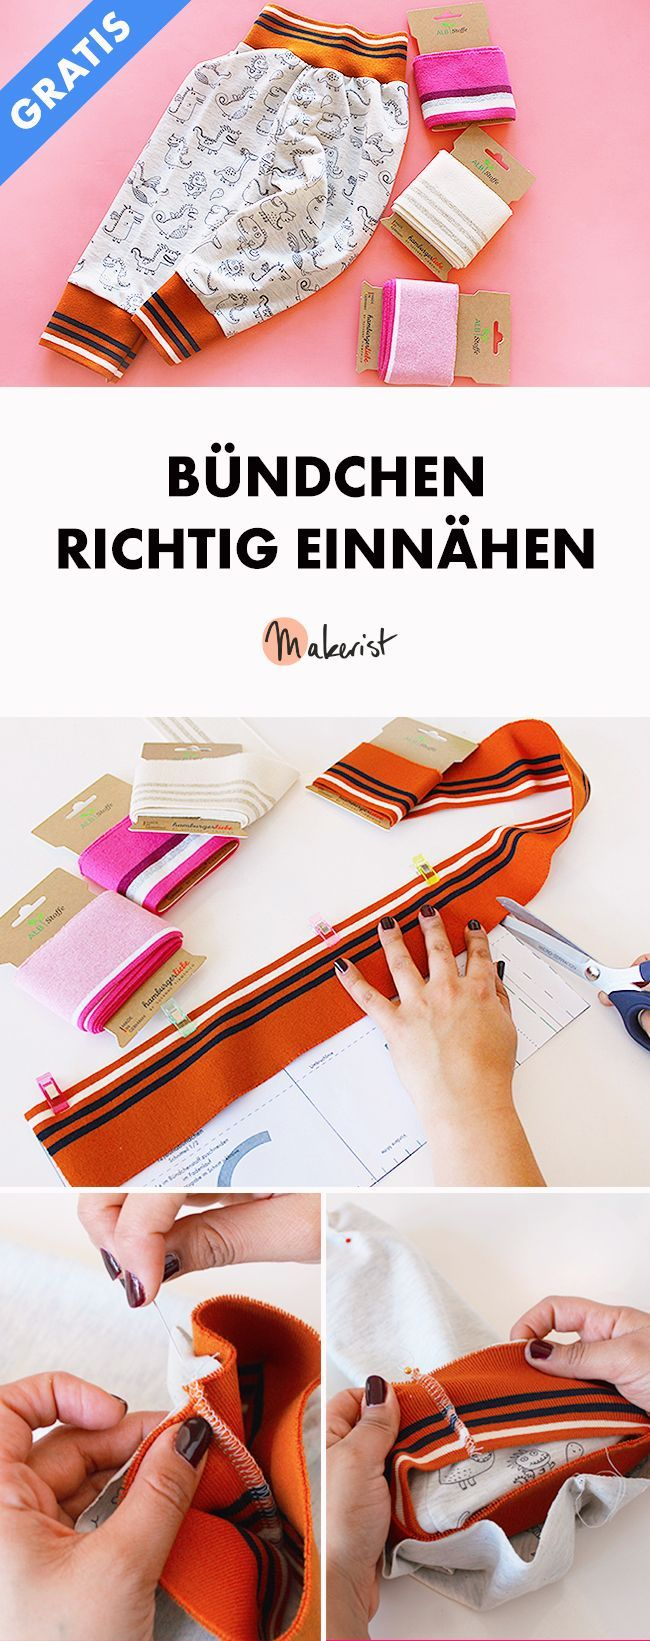 713 best Nähen | sewing images on Pinterest | Abendessen ...